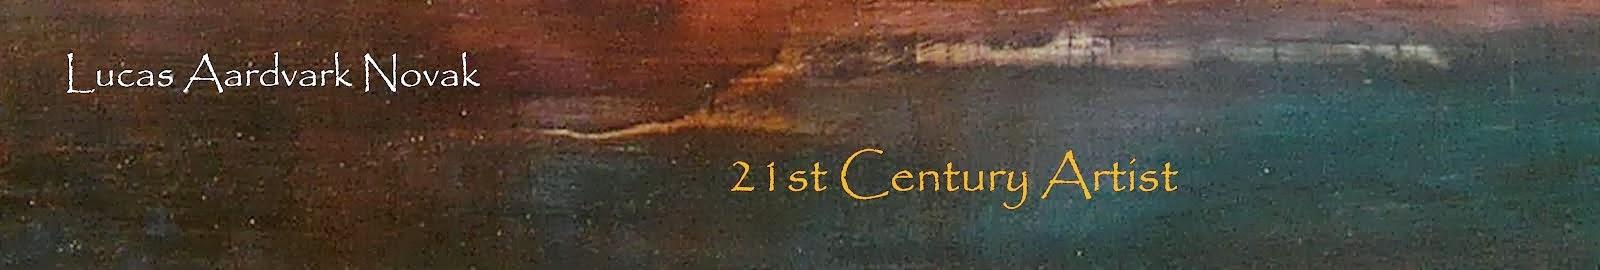 21st Century Artist